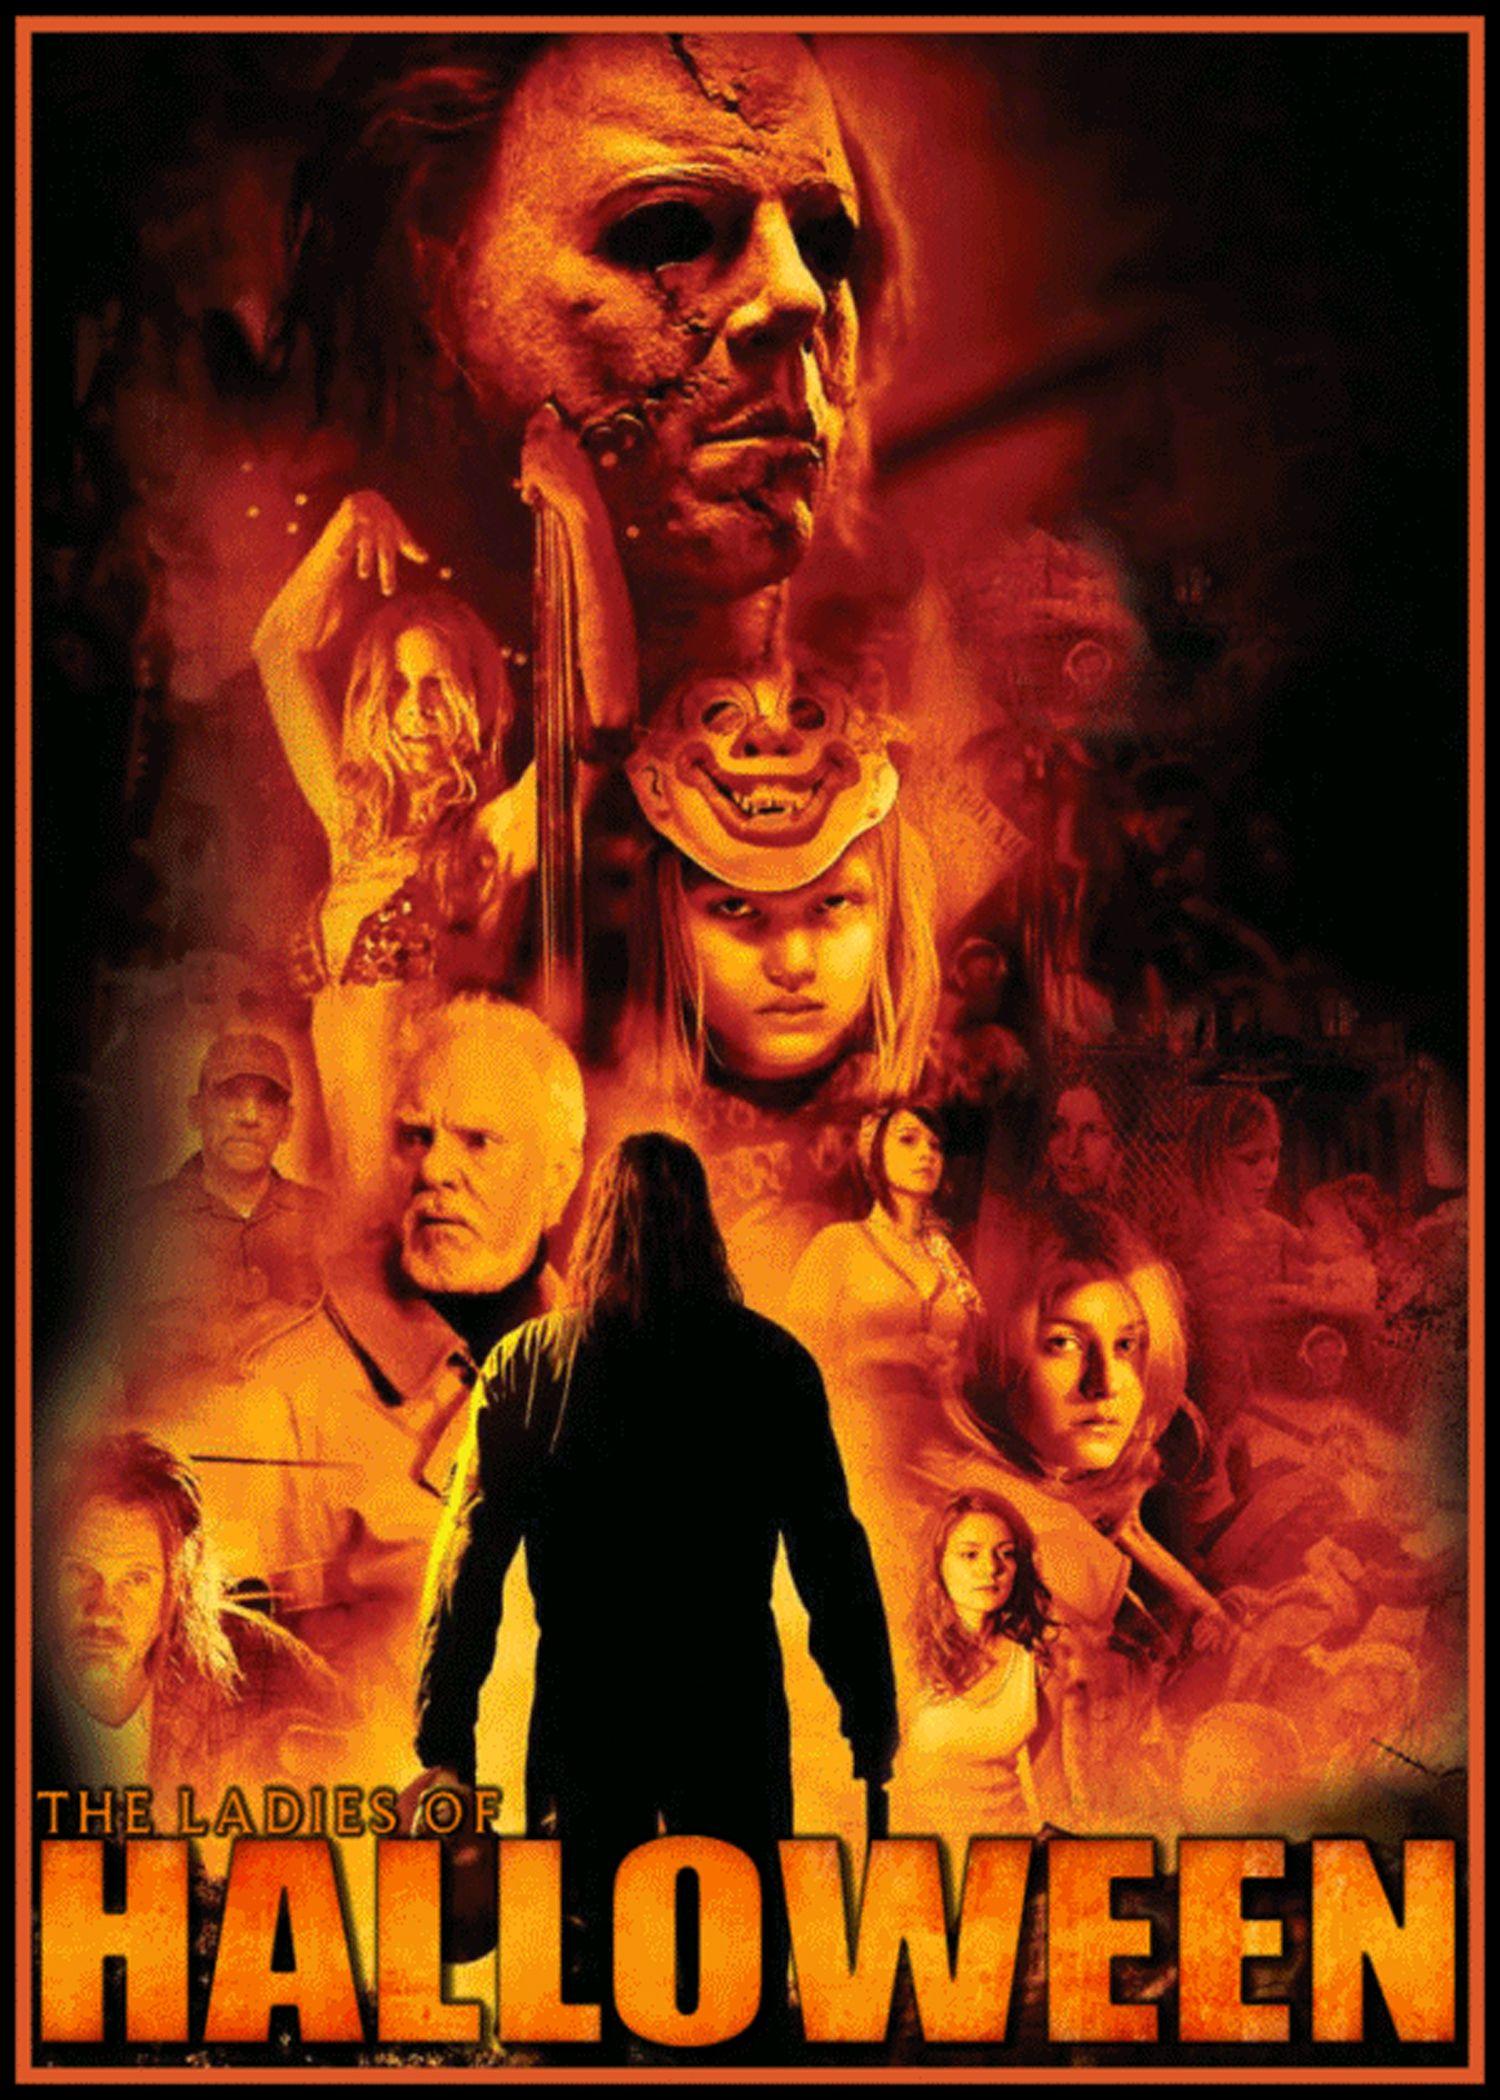 Halloween | Maison noire | Pinterest | Michael myers, Horror and Movie